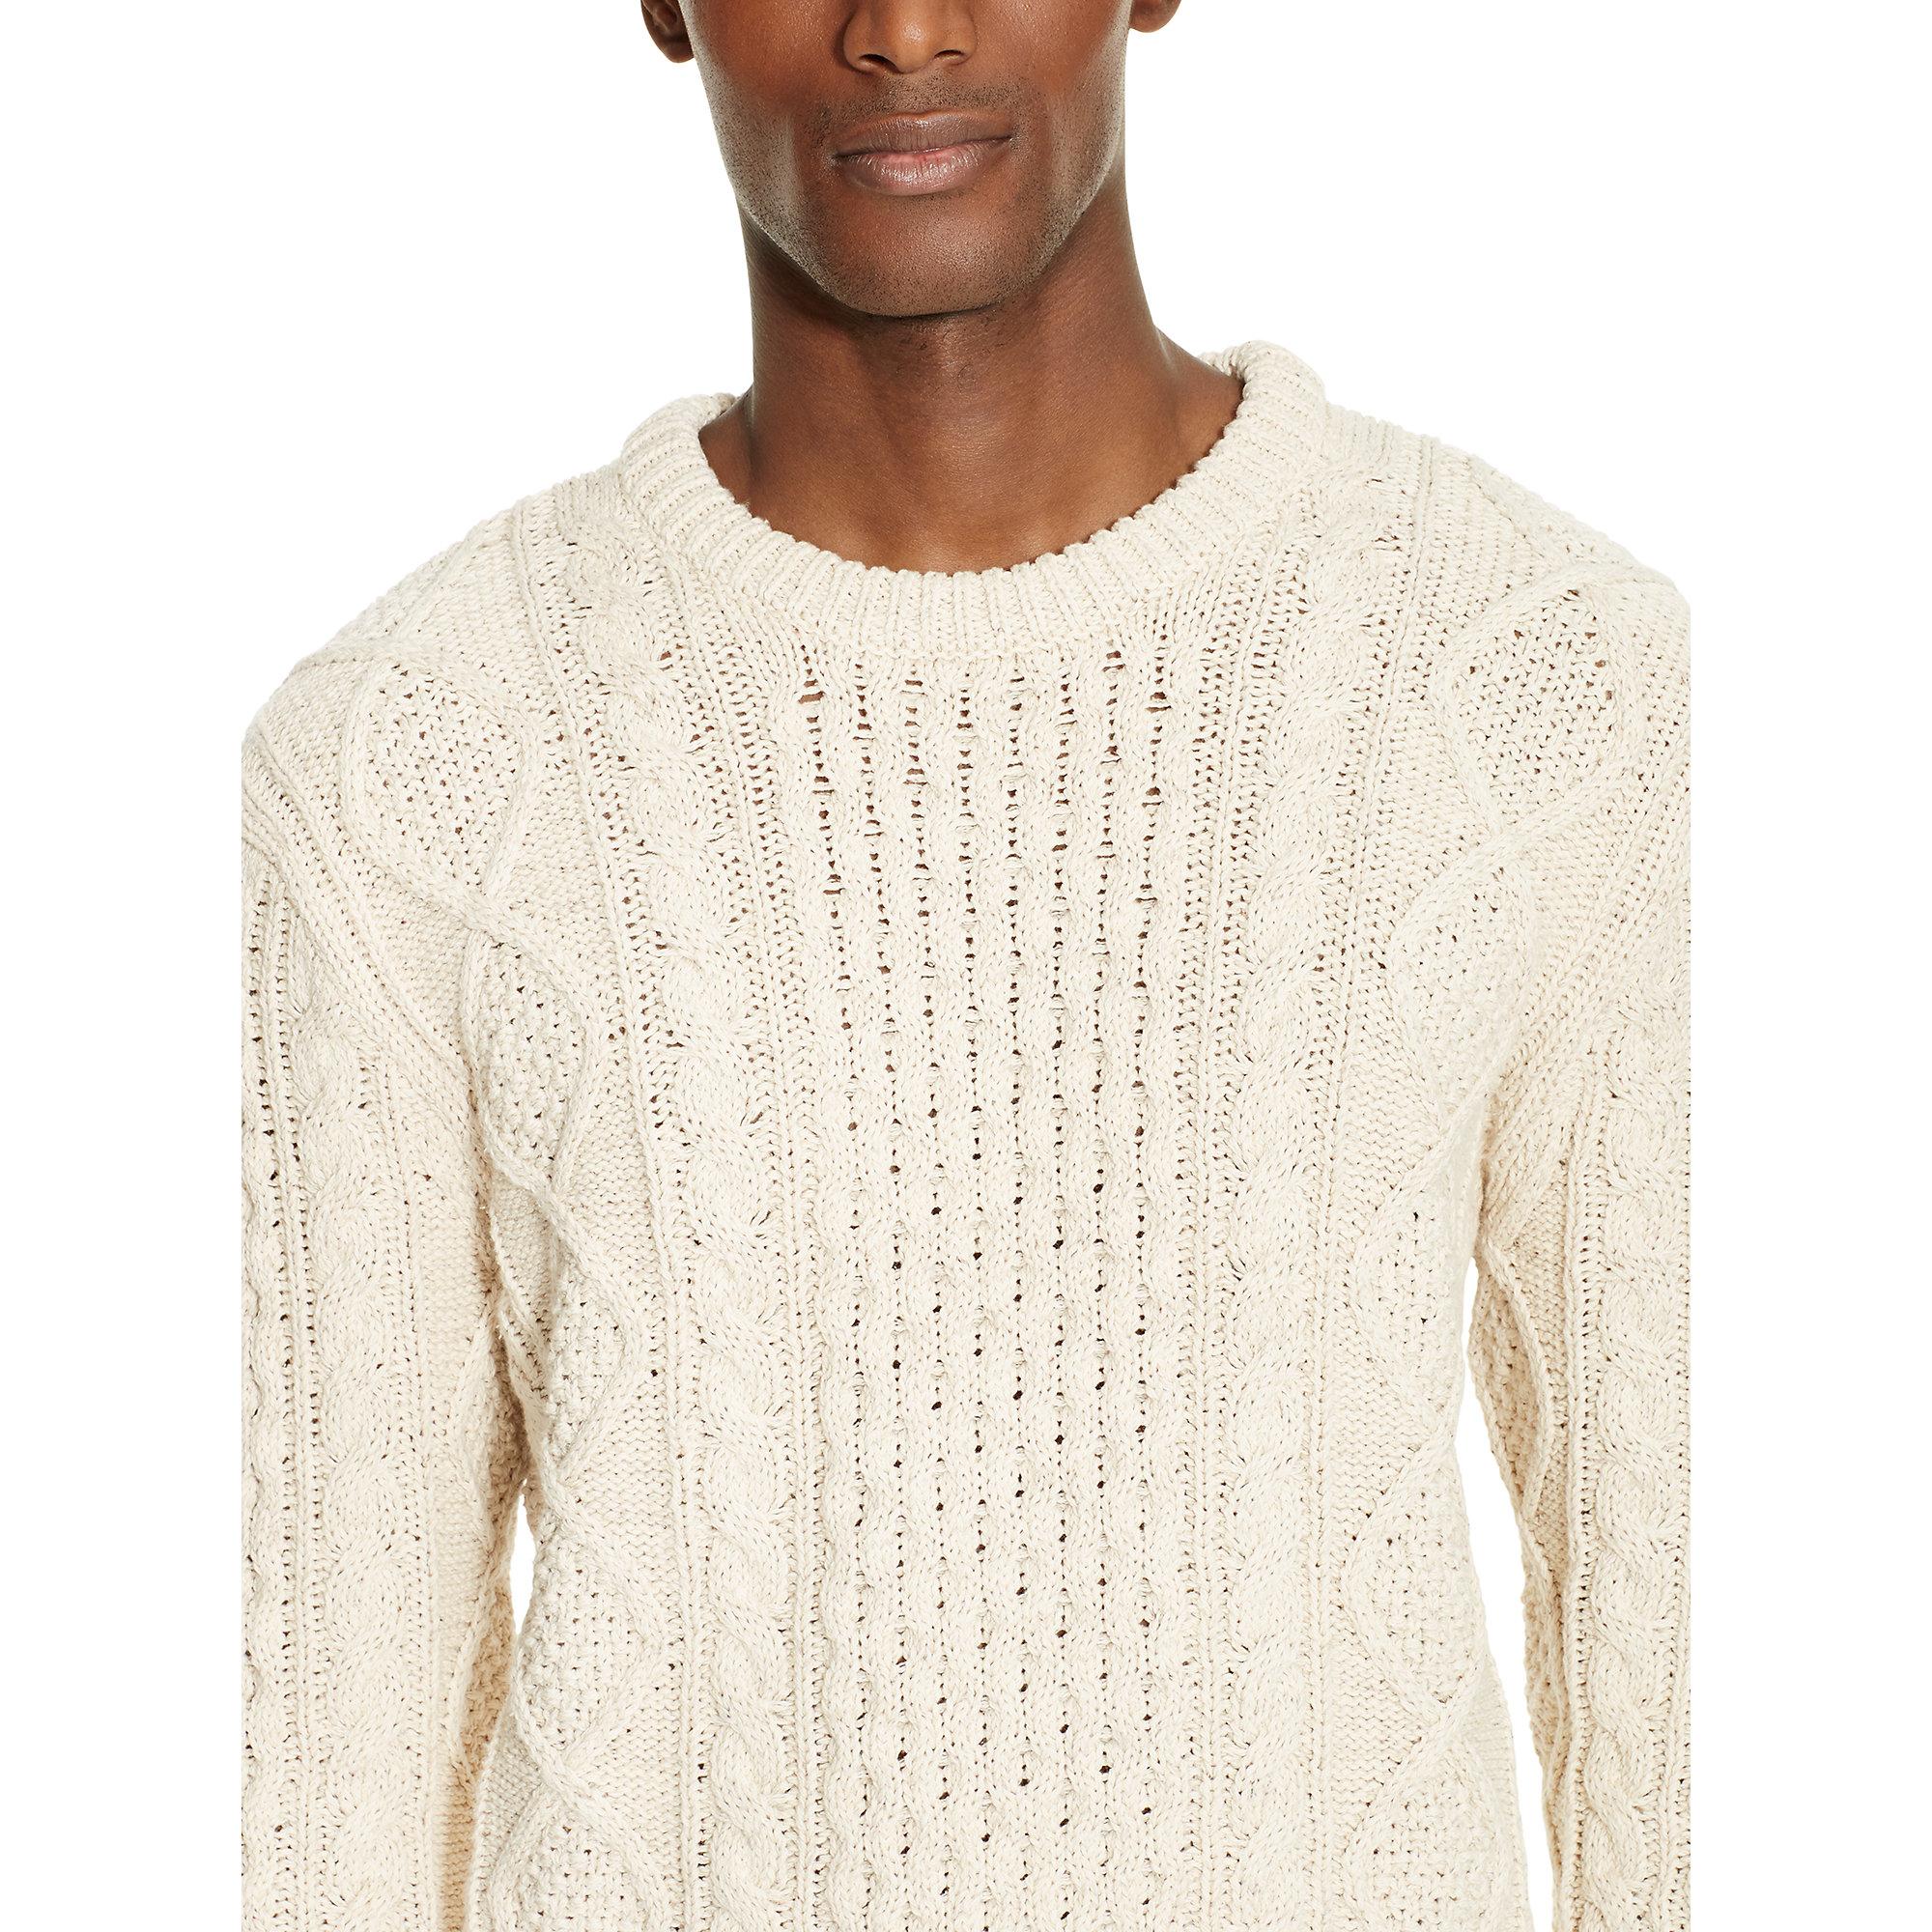 Polo ralph lauren Aran-knit Cotton Sweater in White for Men | Lyst